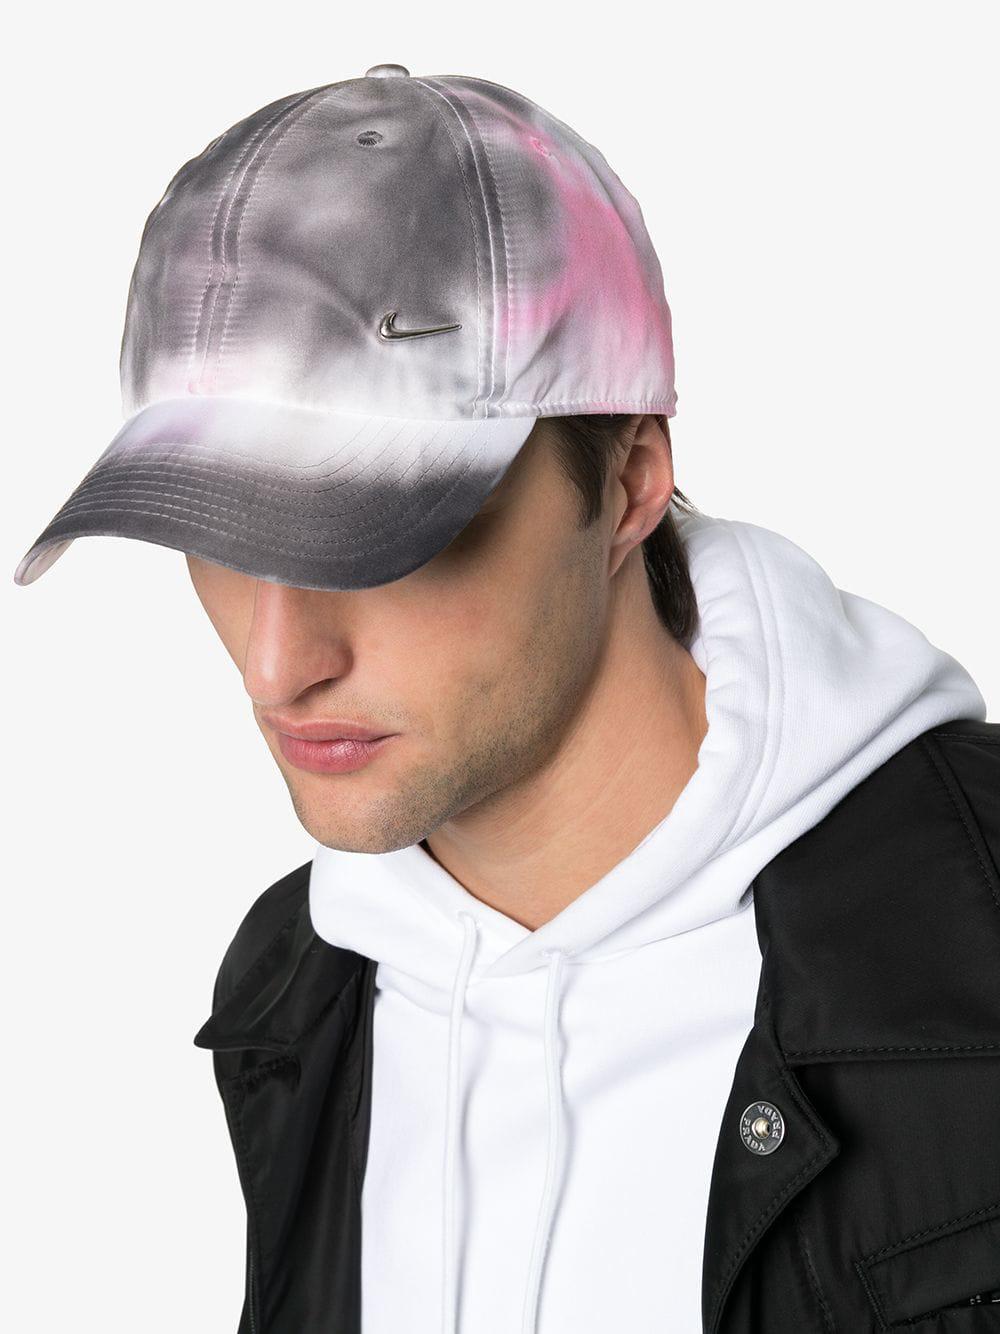 628622df44d4dd Alyx 1017 9Sm Pink And Grey Sponge Camo Print Baseball Cap In 123 Pink Camo